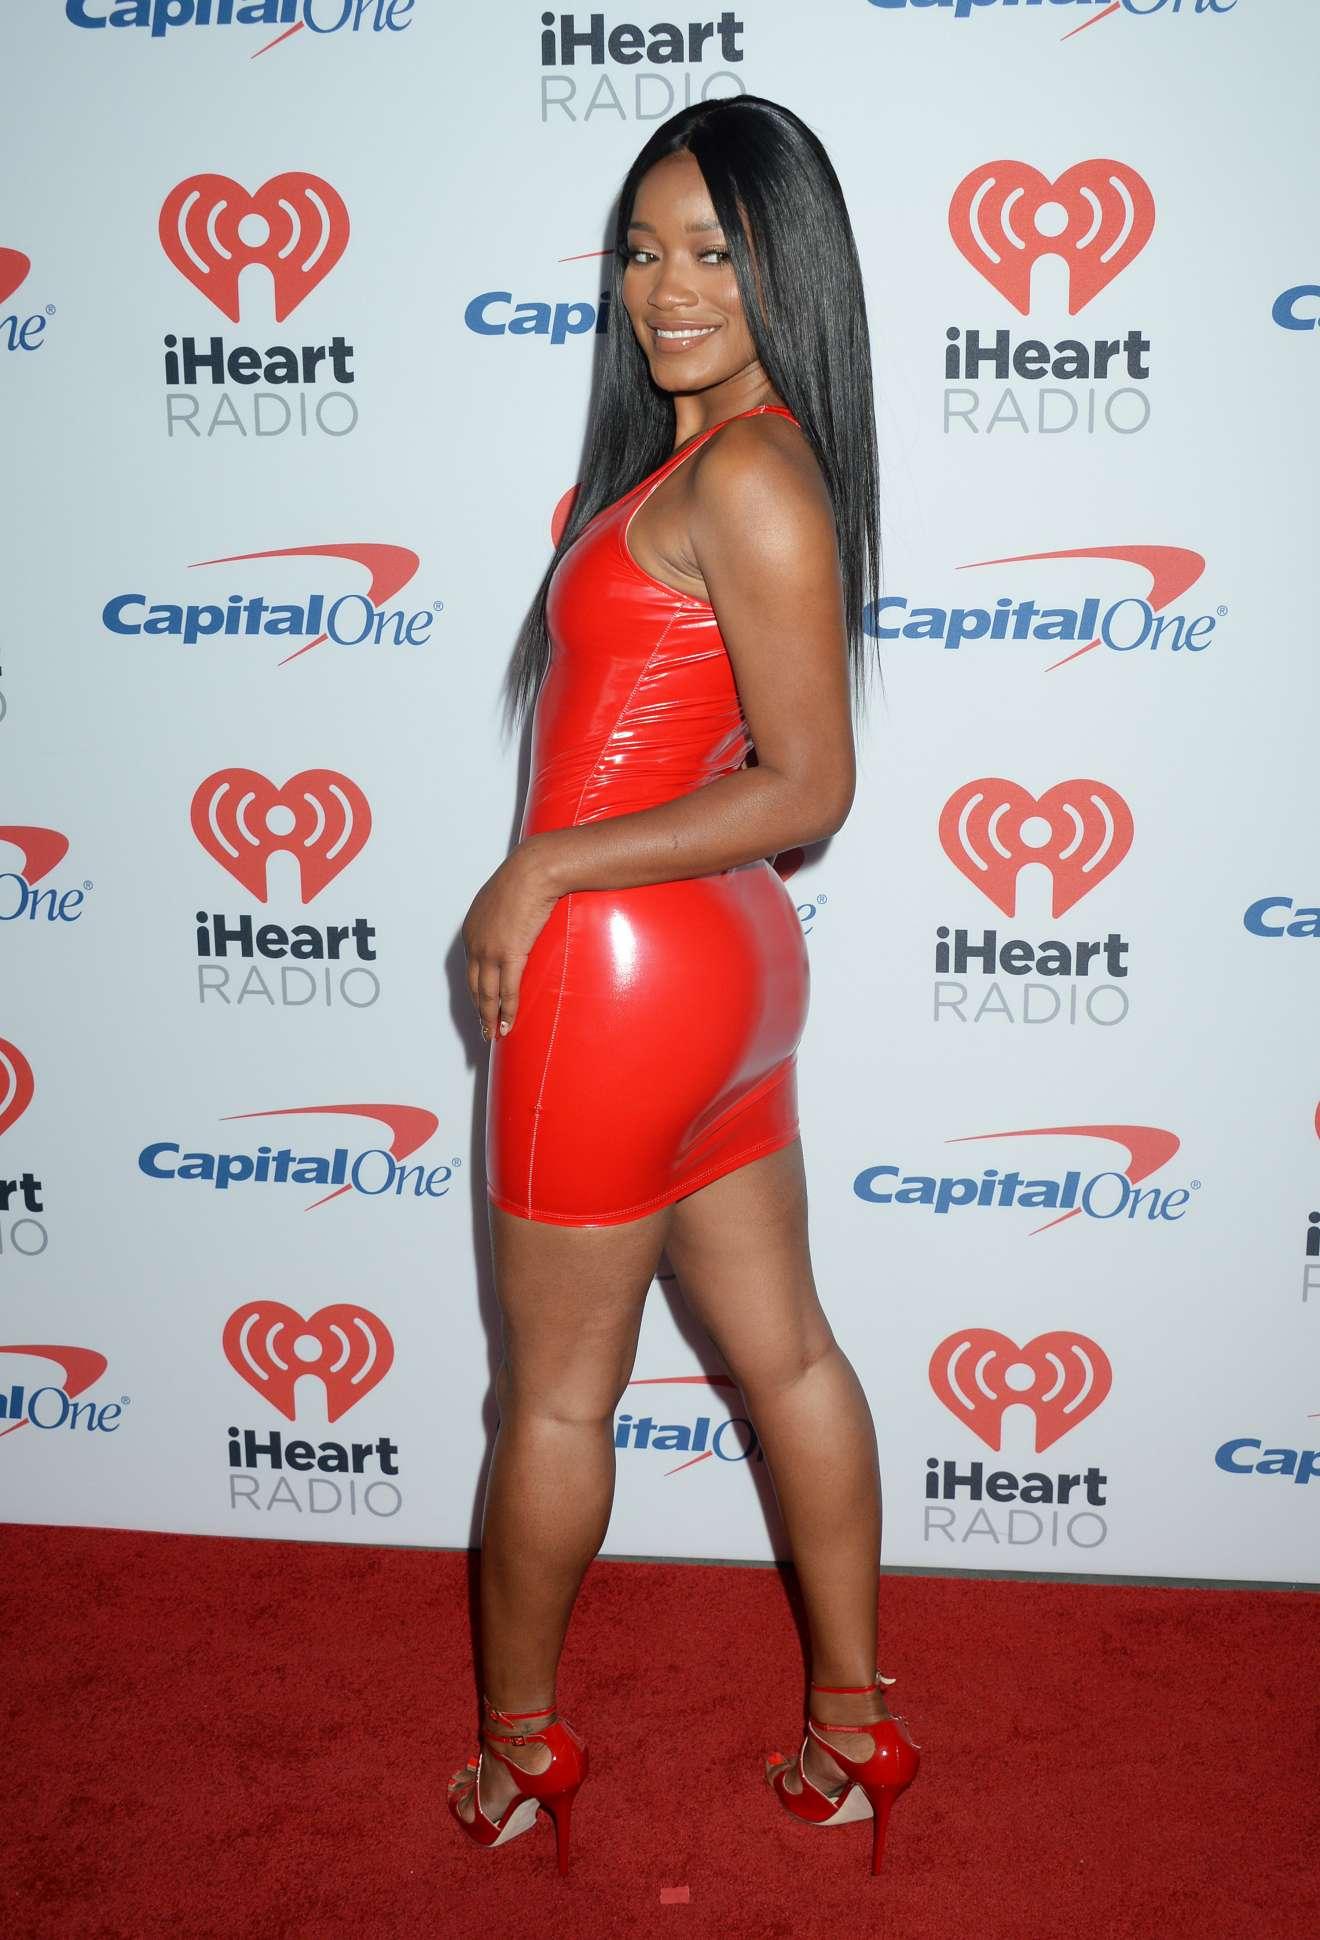 Keke Palmer 2017 : Keke Palmer: Hot in Red Dress at 2017 iHeartRadio Music Festival in Las Vegas-18